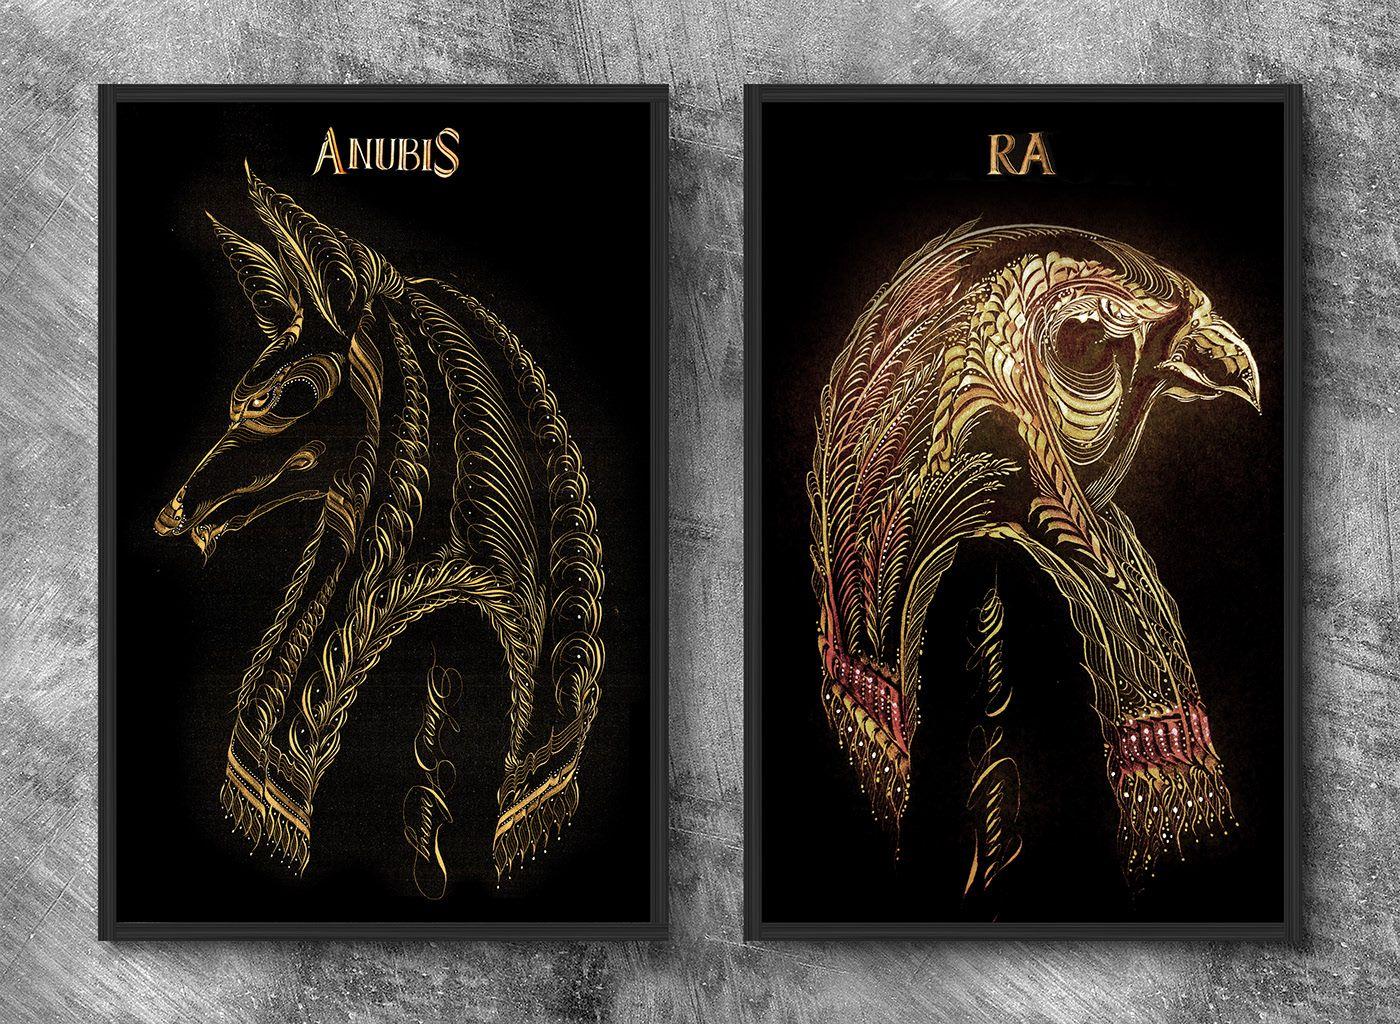 Egypt Gods - Ra & Anubis on Behance in 2020 | Ancient egyptian gods,  Anubis, Egypt tattoo